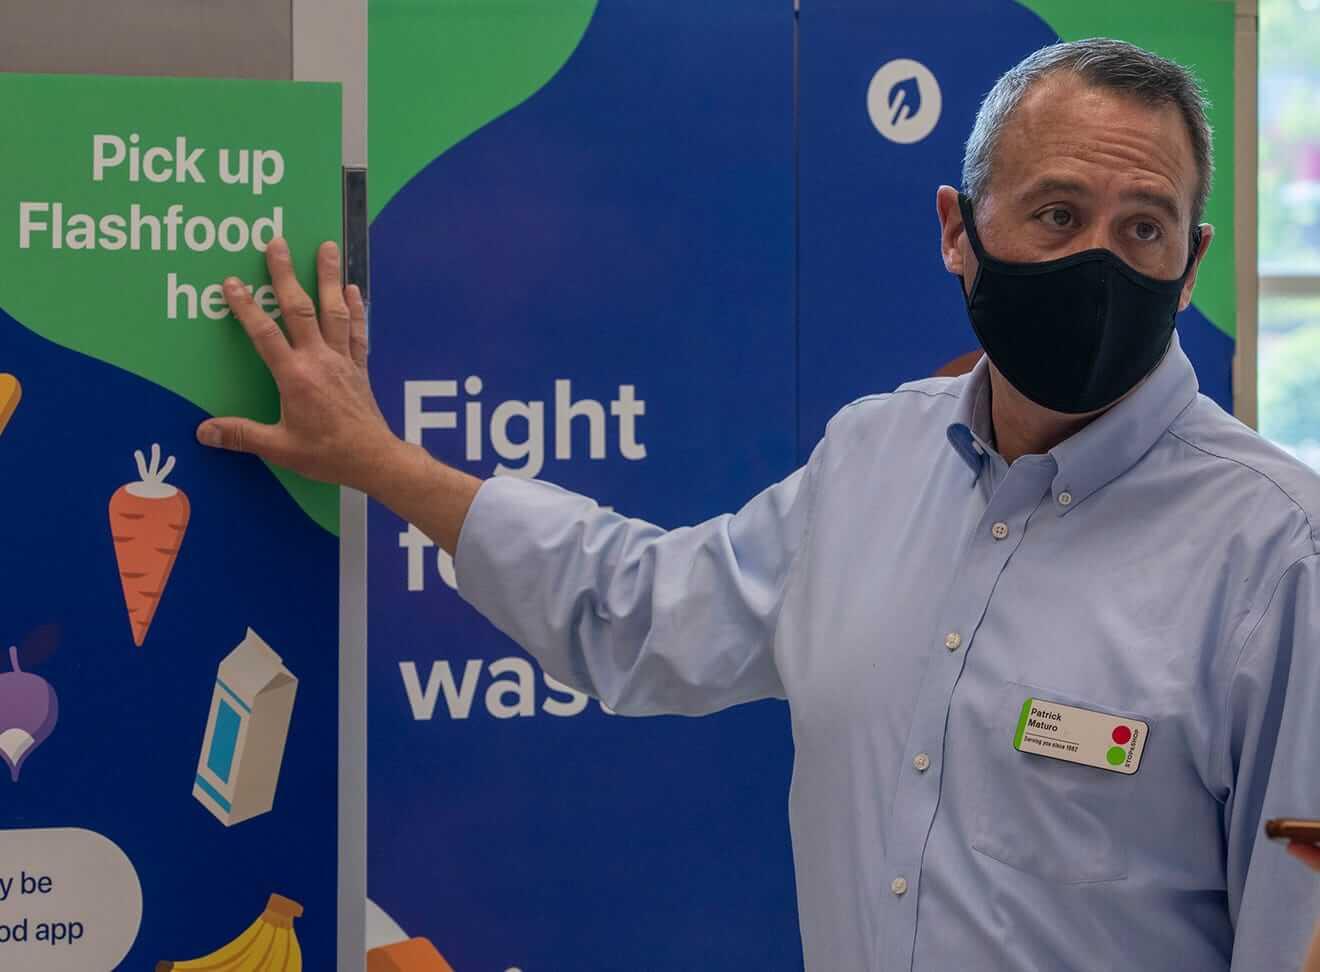 Shoppers enjoy grocery deals and help reduce food waste through Stop & Shop pilot Flashfood app program